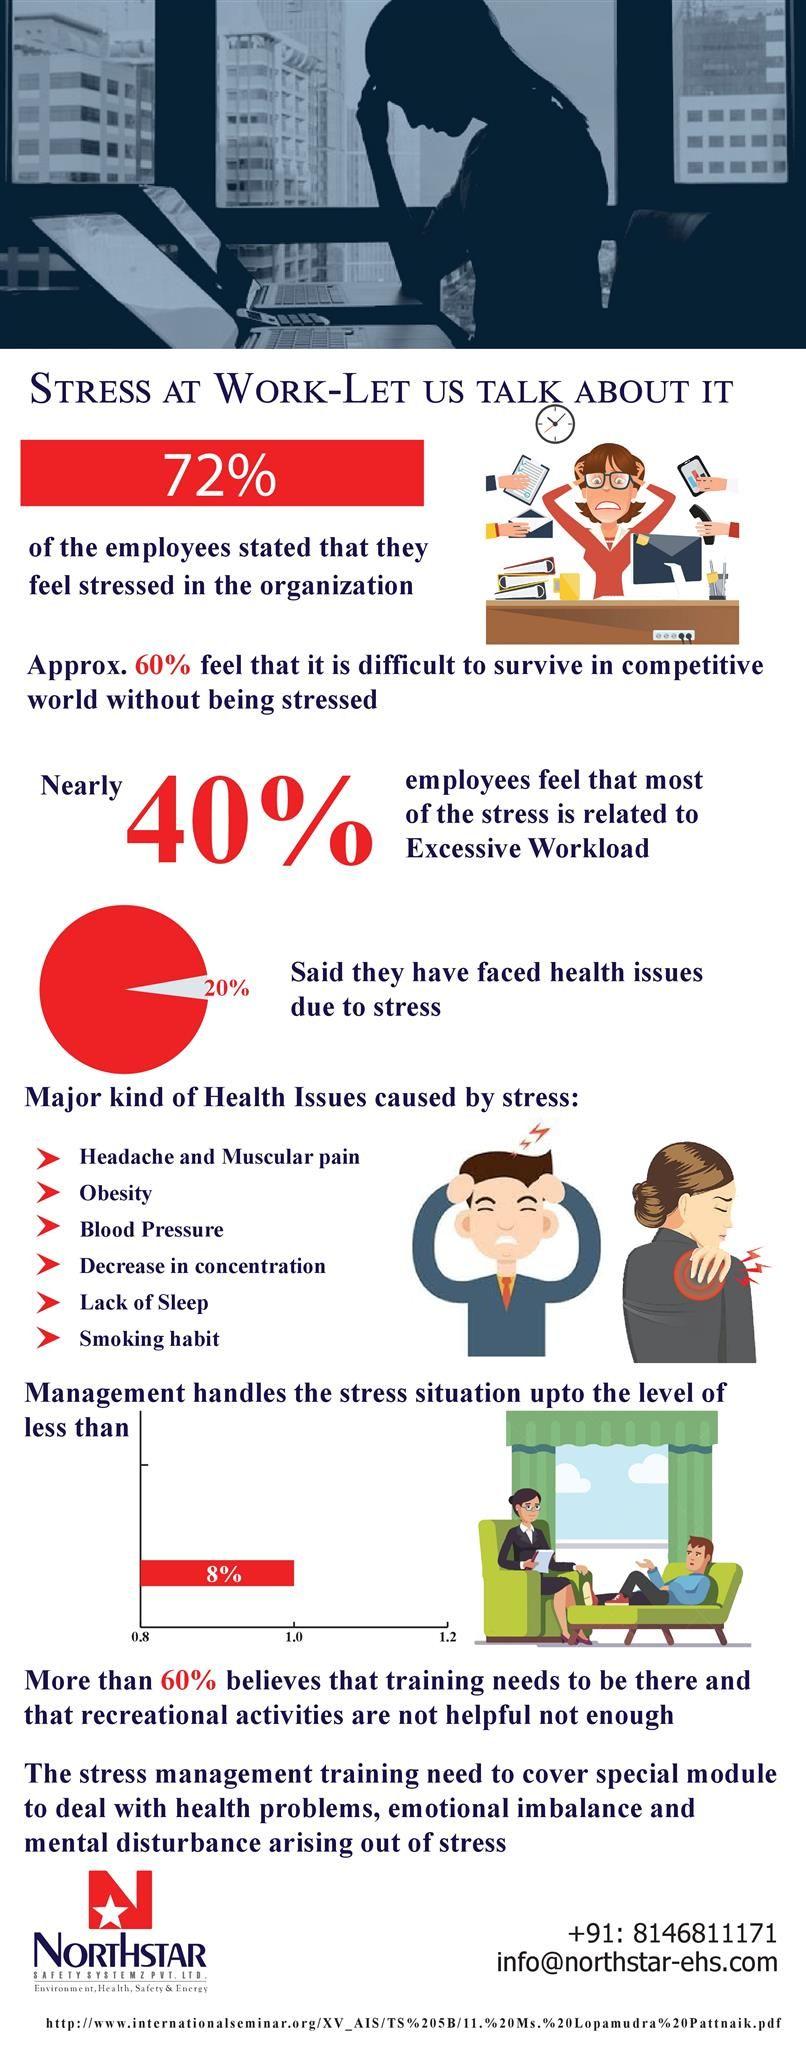 northstar behavioral health staff